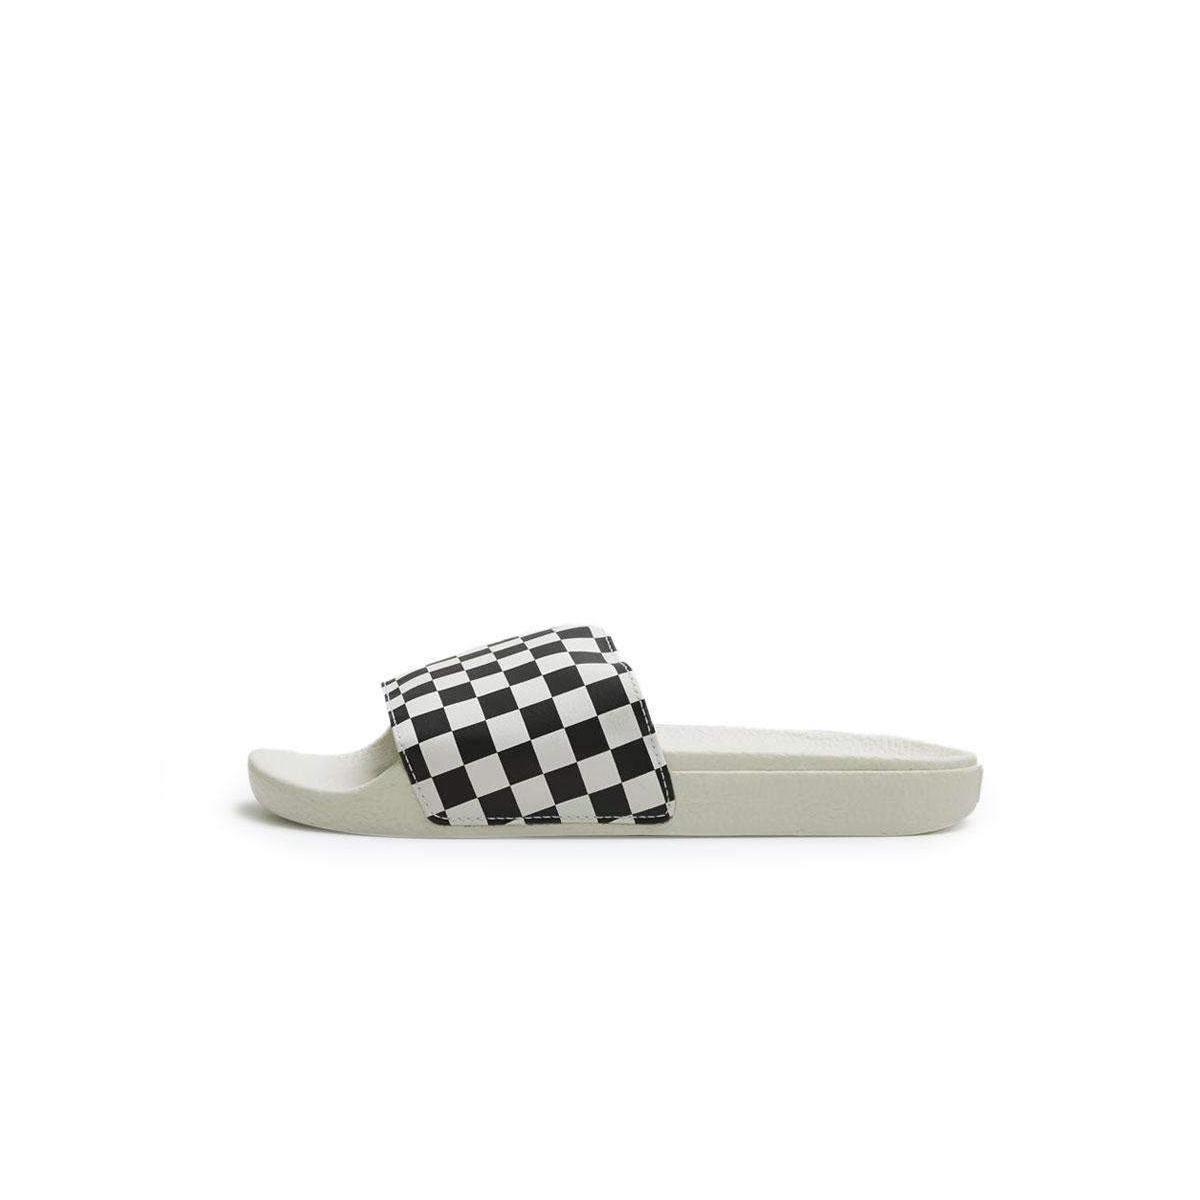 Vans Slide-On Checkerboard Slide